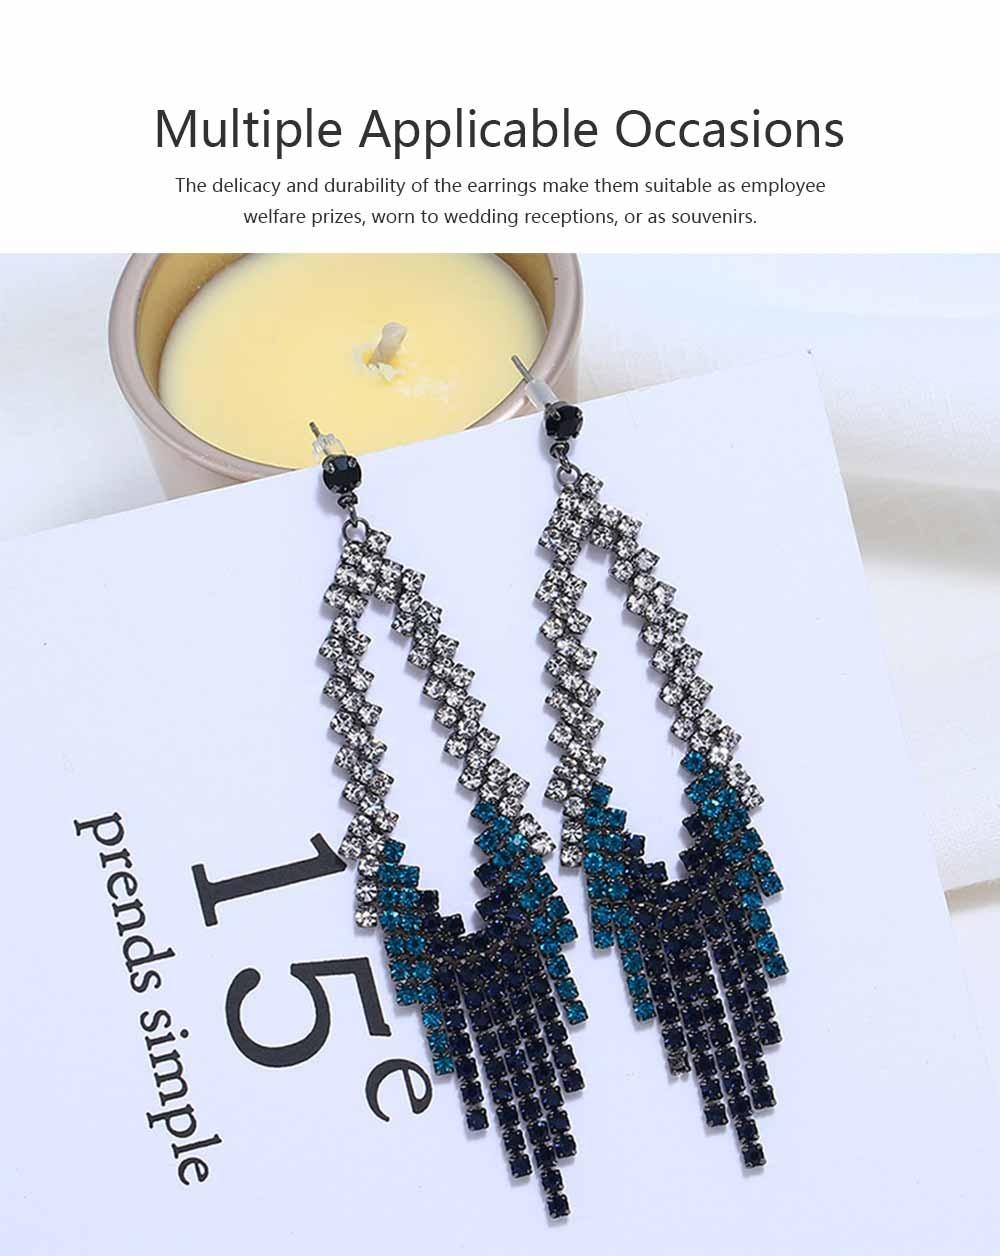 Women Tassel Earring Zinc Alloy Material Decoration Diamond Setting Process Jewelry Allergy-resistant Ear Pendant 5